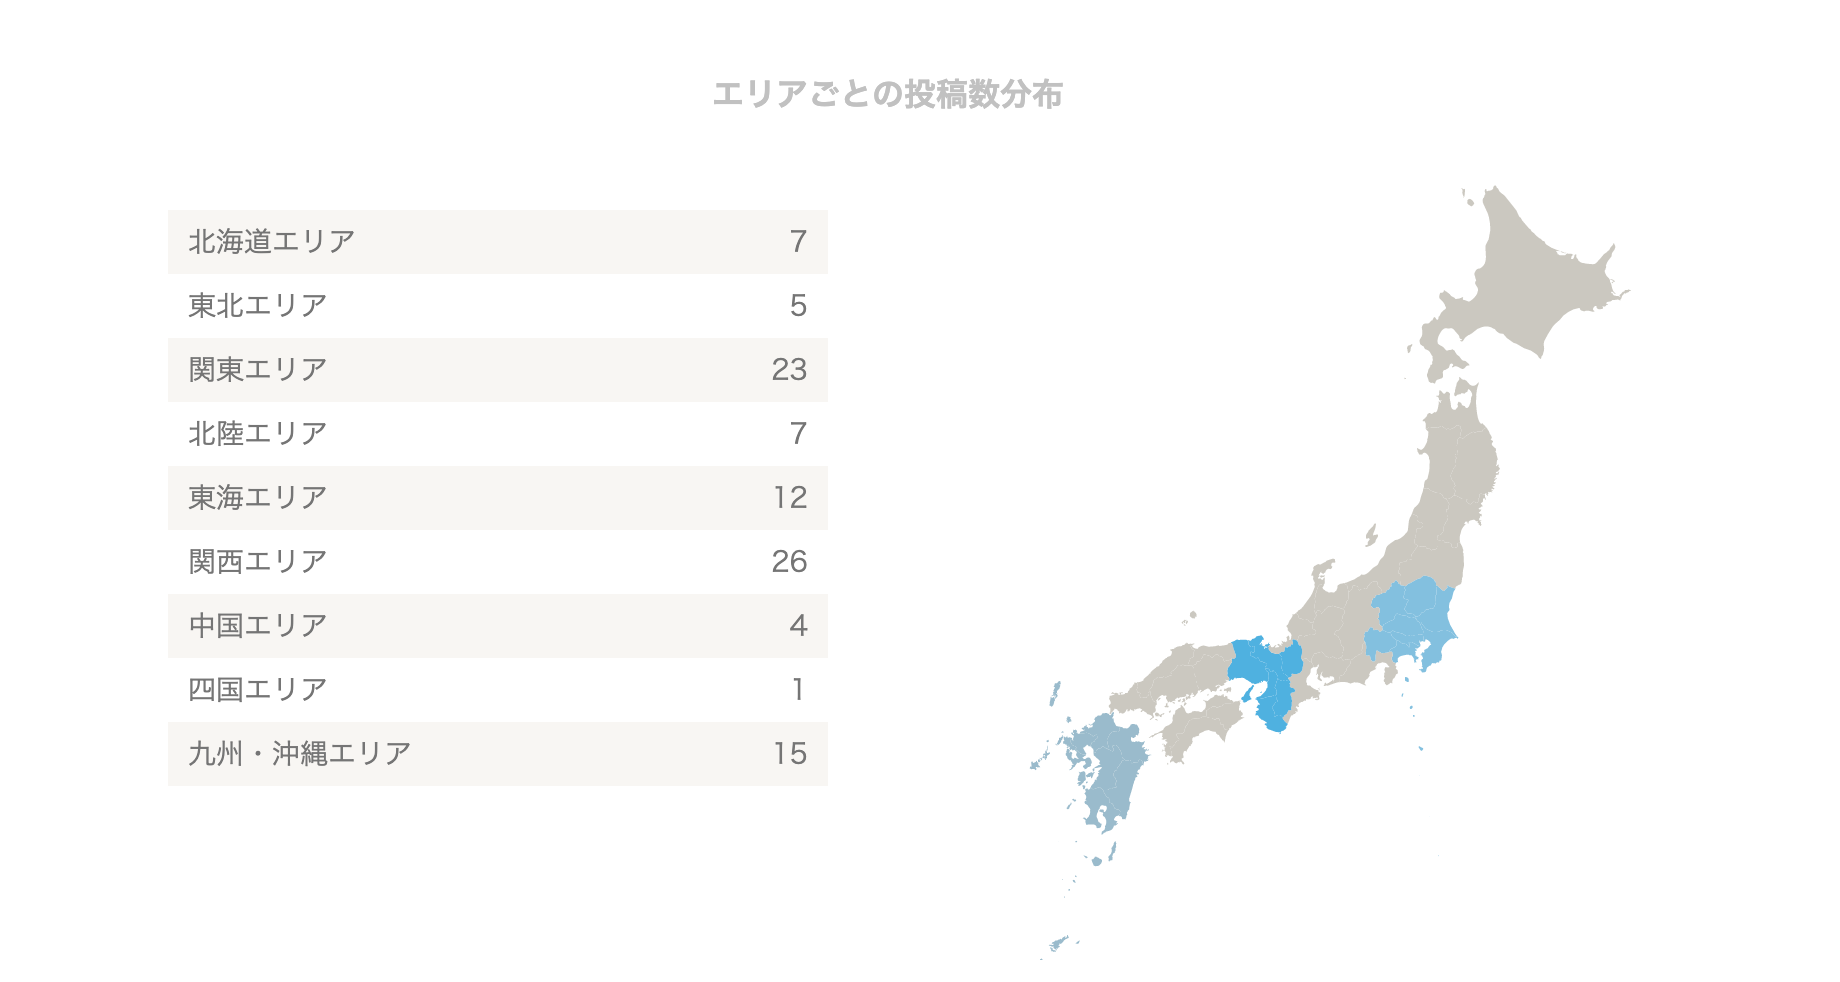 「○○X」検索ユーザー